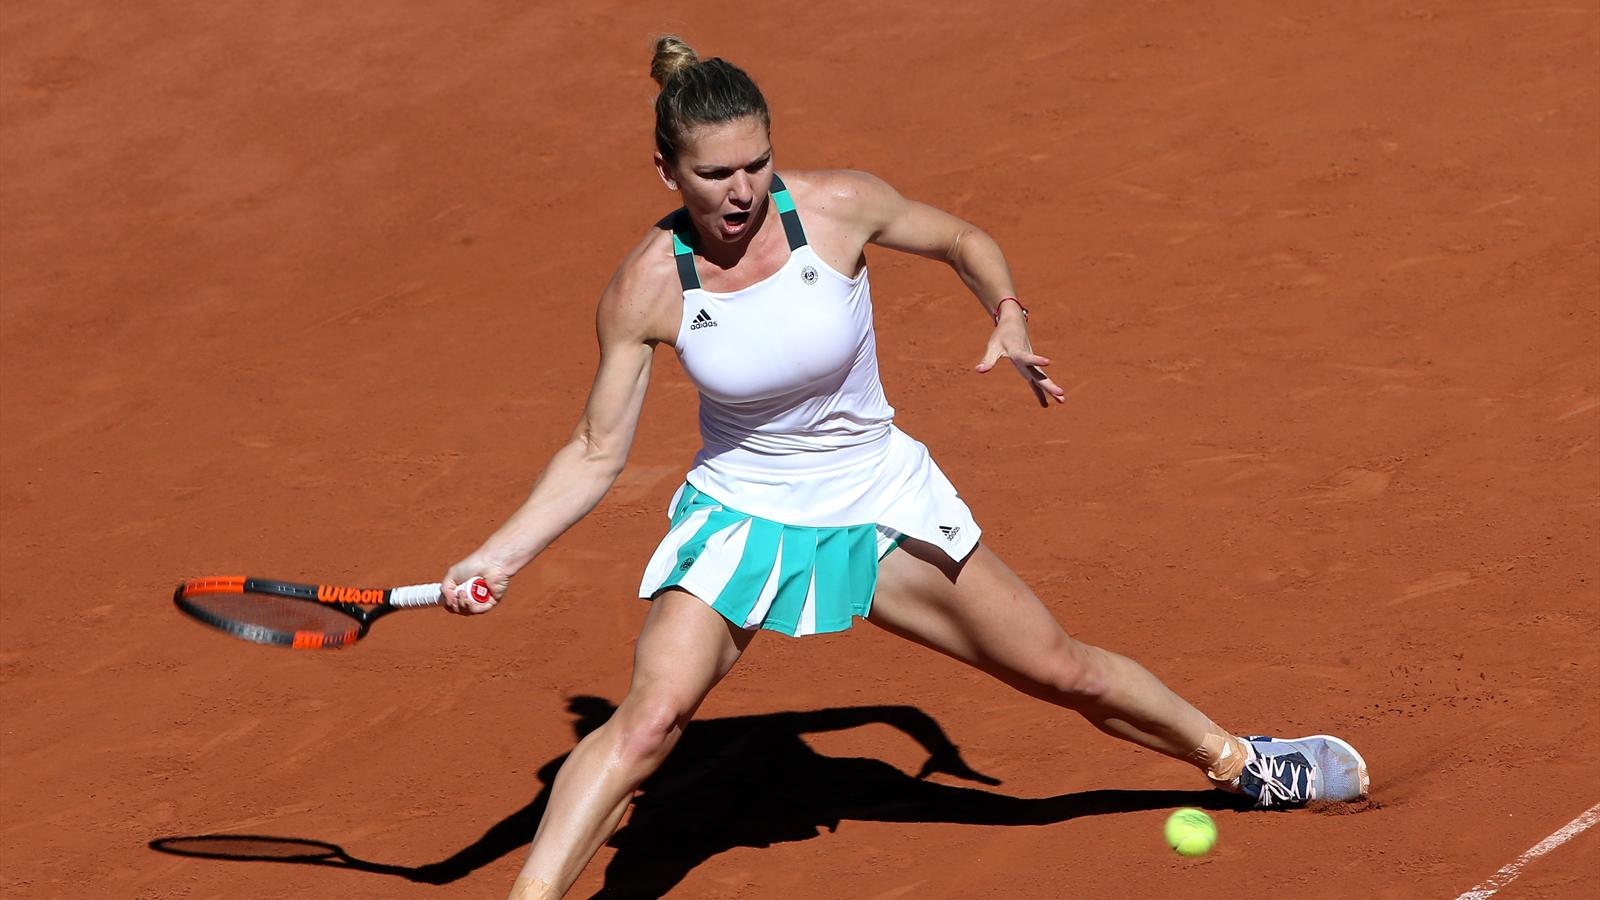 French Open defeat still 'killing me' says Simona Halep - Tennis - Eurosport